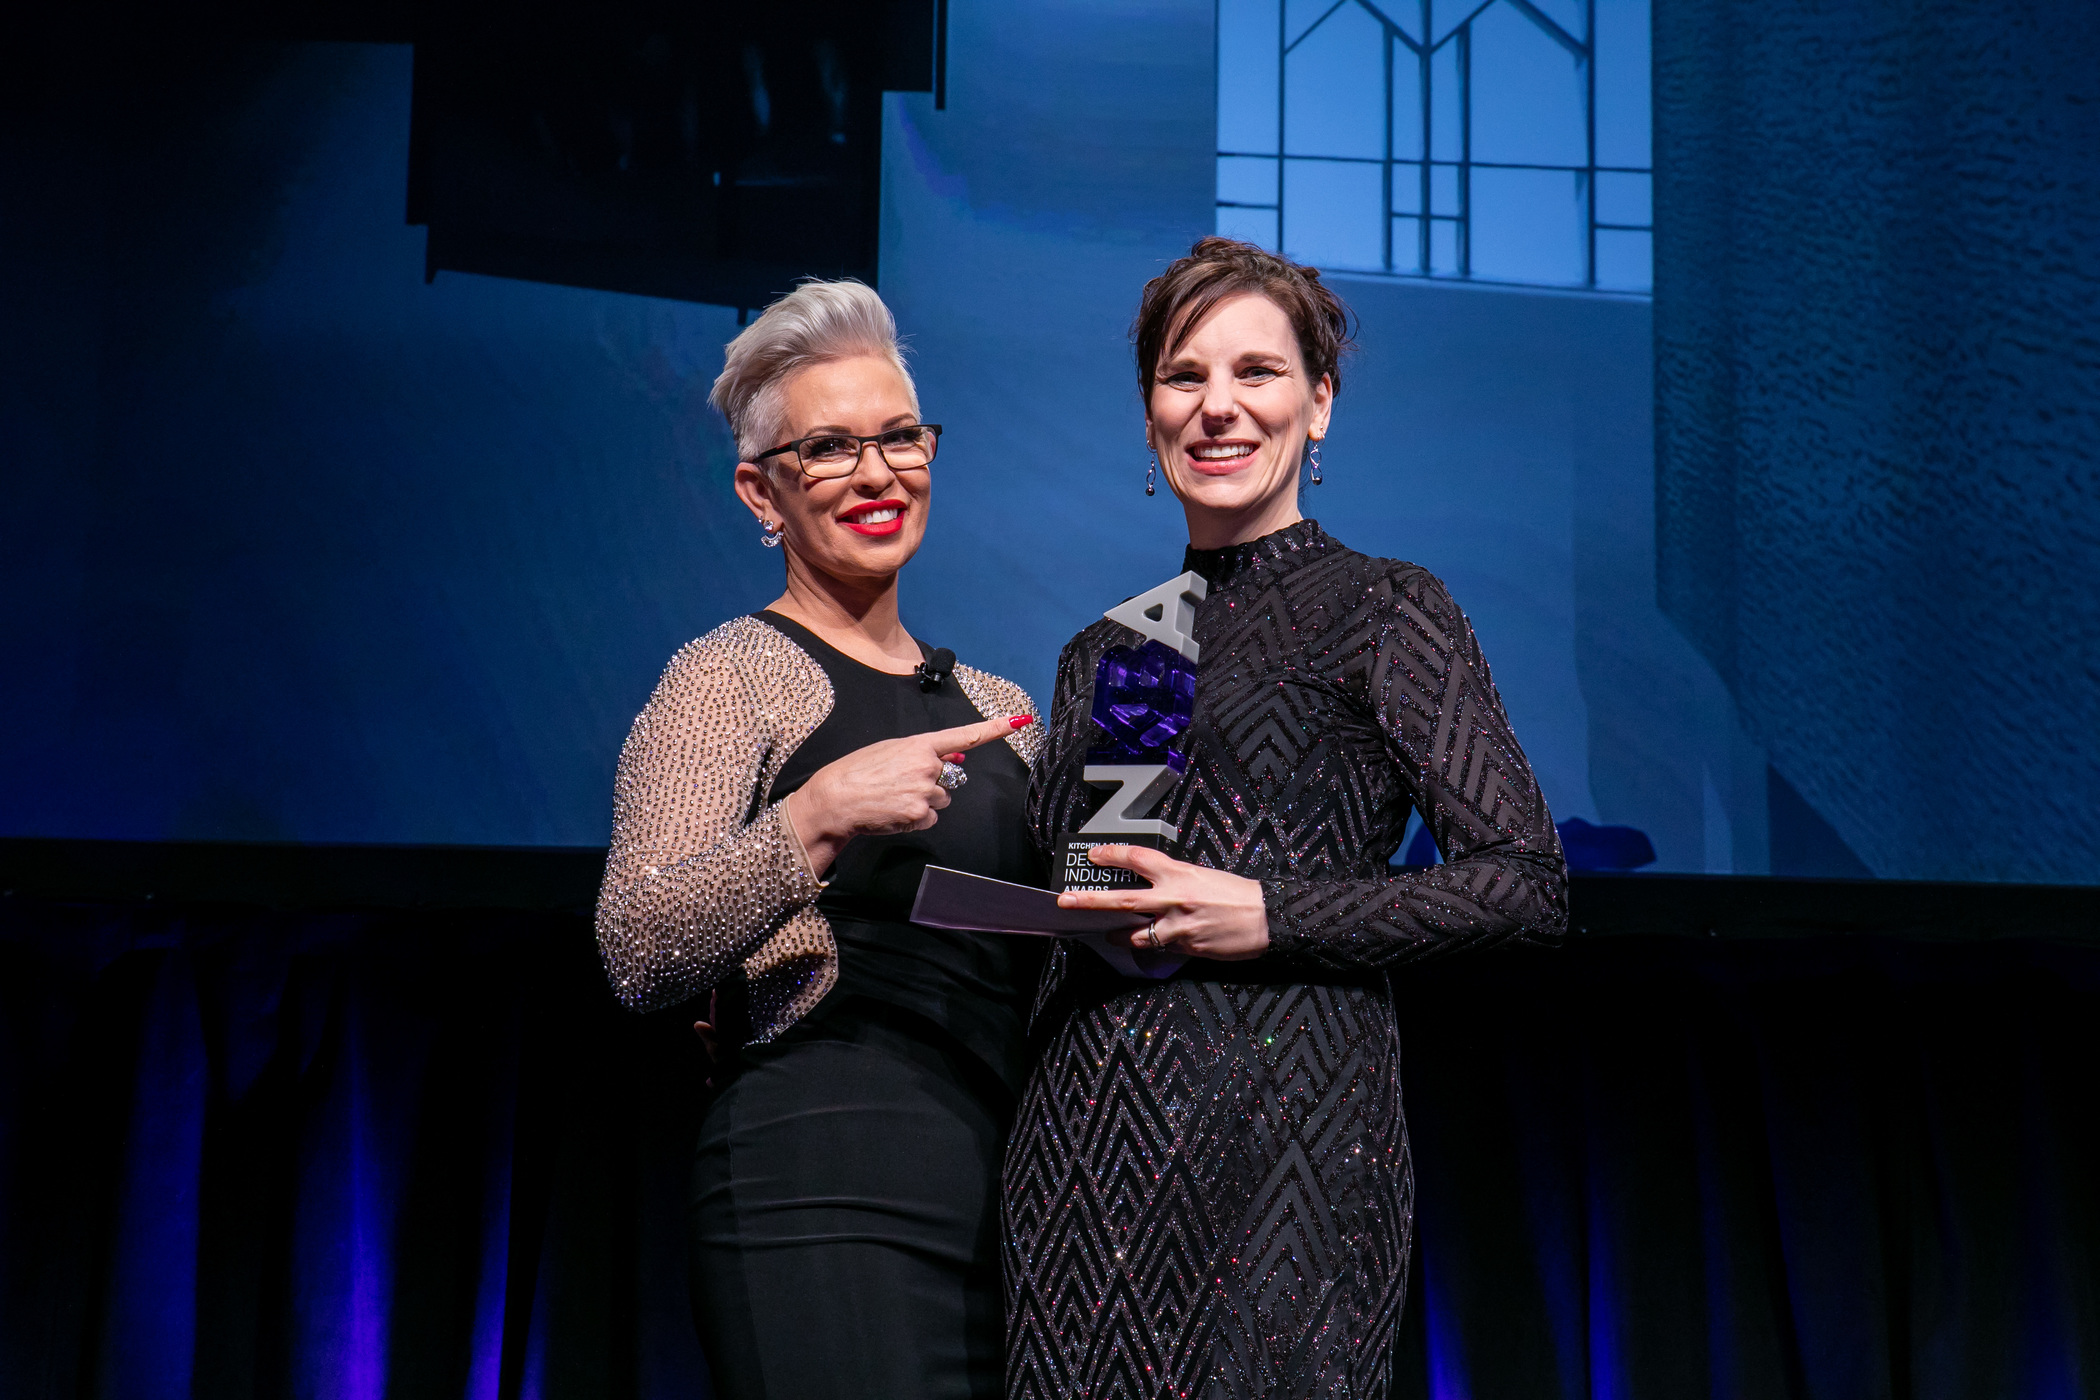 NKBA Design + Industry Awards, KBIS 2020